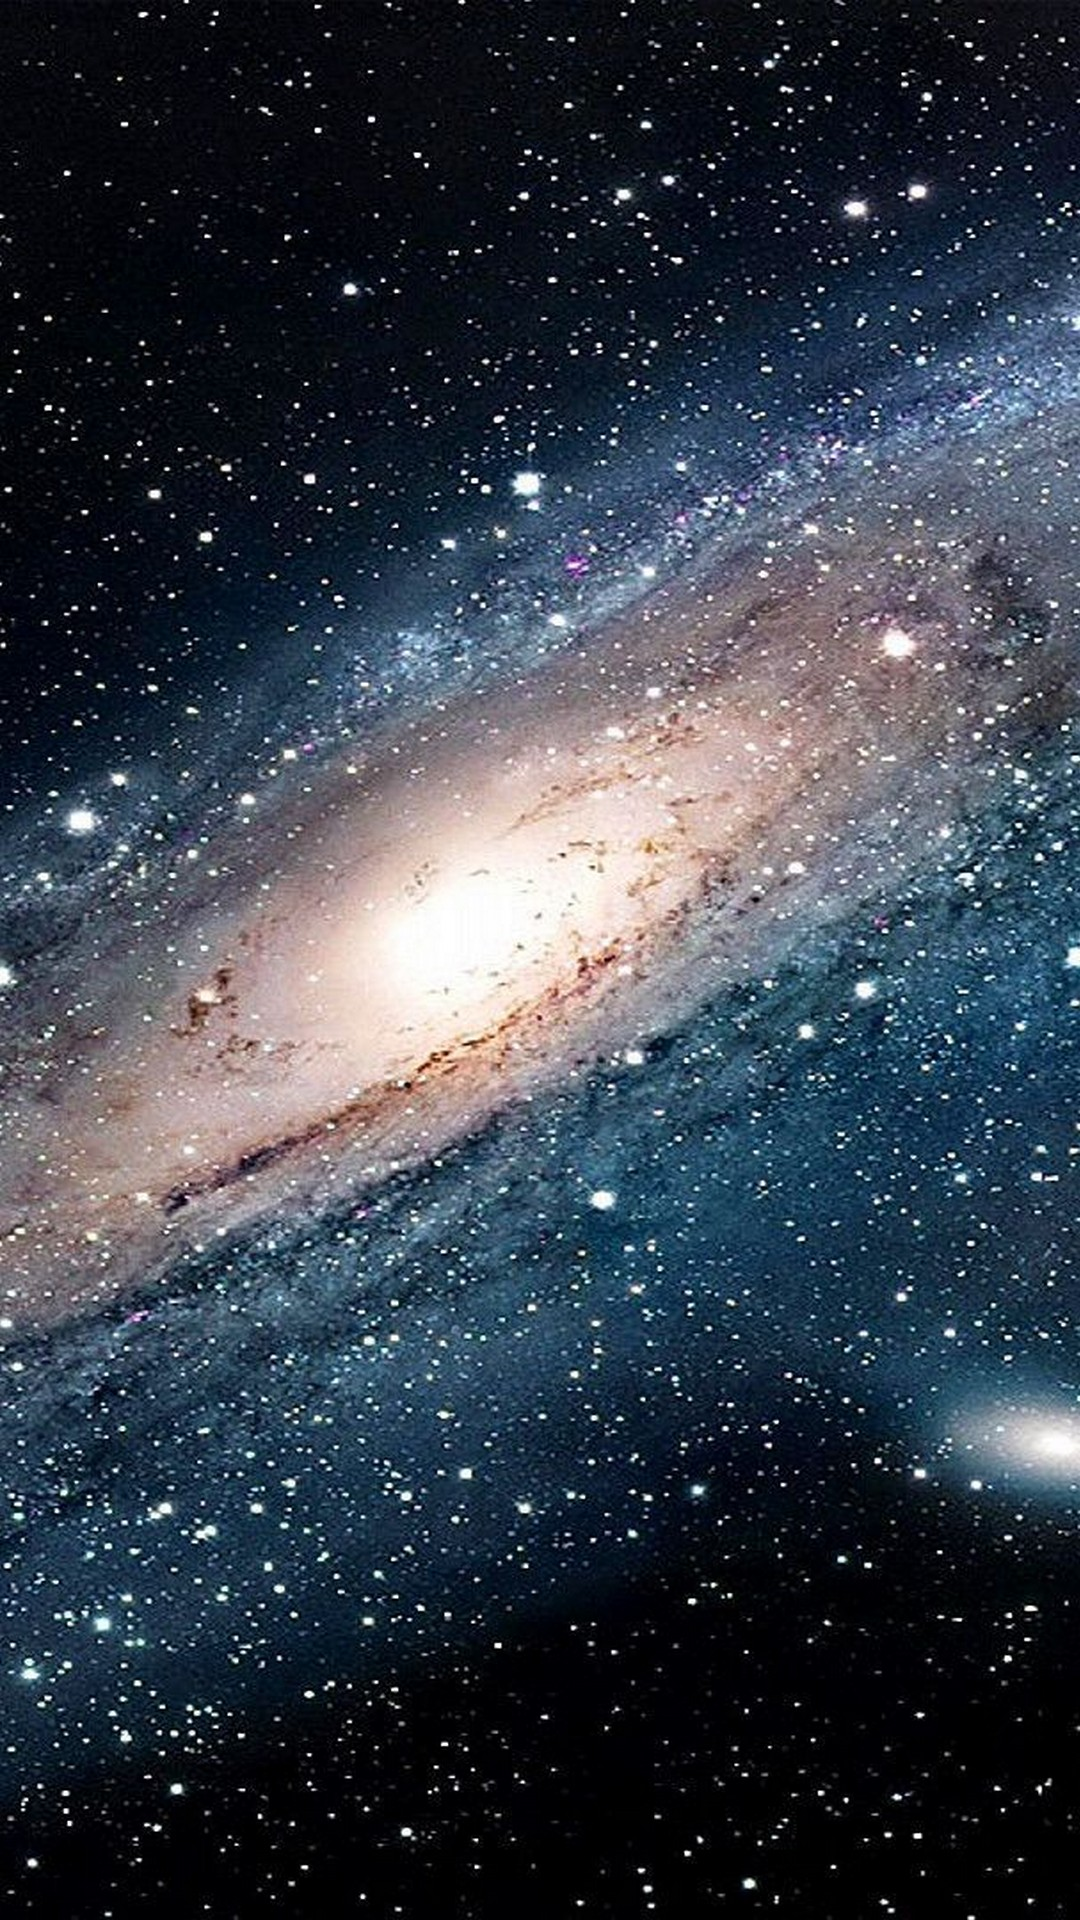 Milchstraße Galaxie iPhone   Raum iPhone Wallpaper   21x21 ...